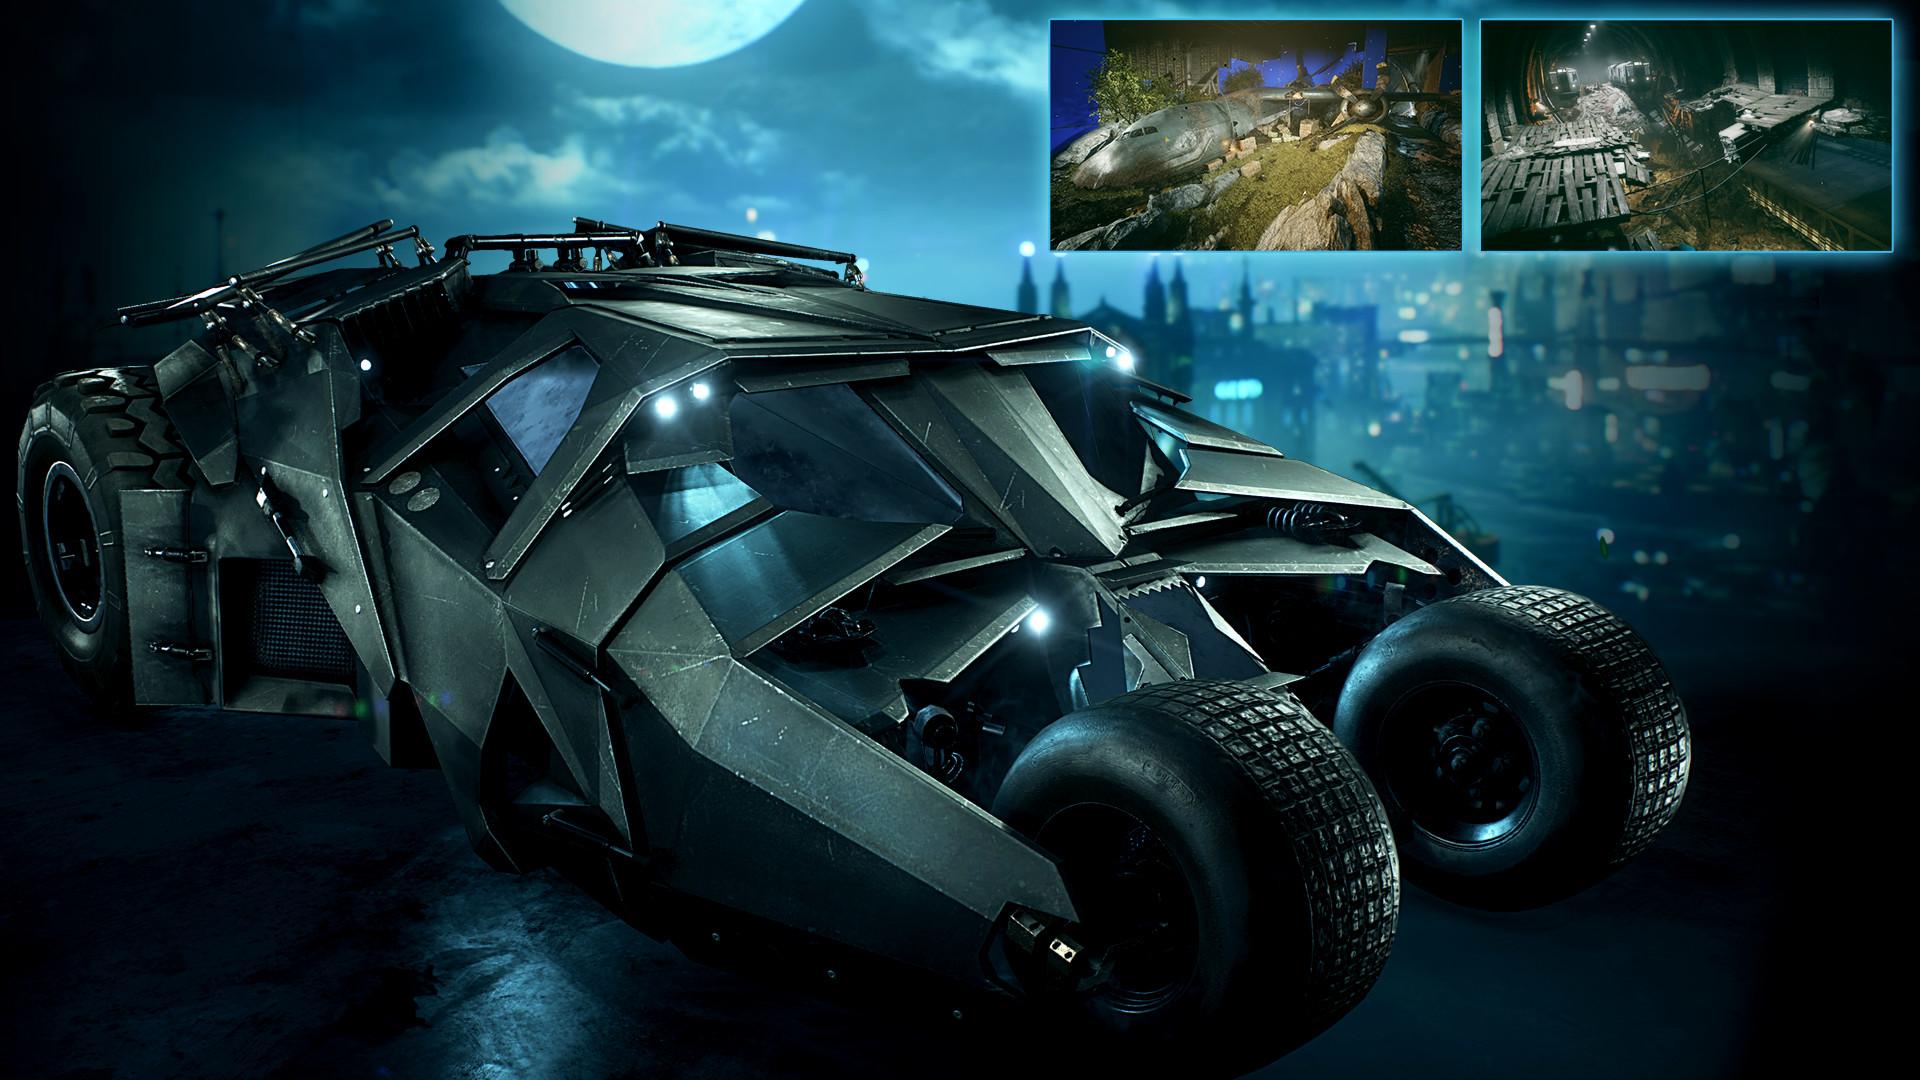 Batman Arkham Knight 2008 Tumbler Batmobile Pack On Steam